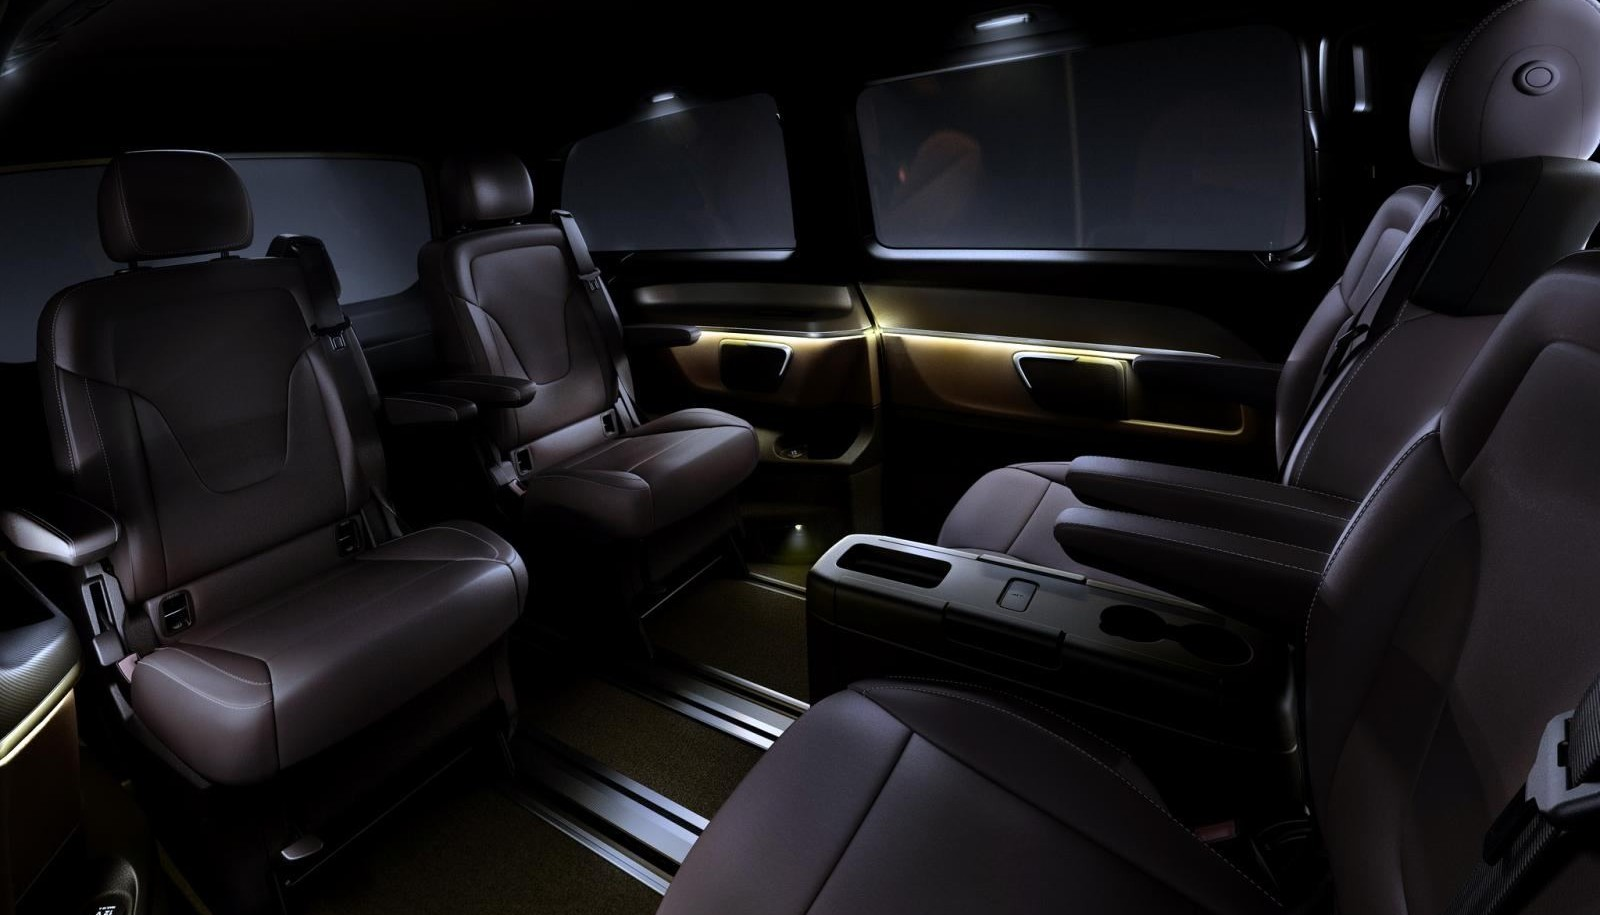 2014-mercedes-benz-v-class-edition-1-9